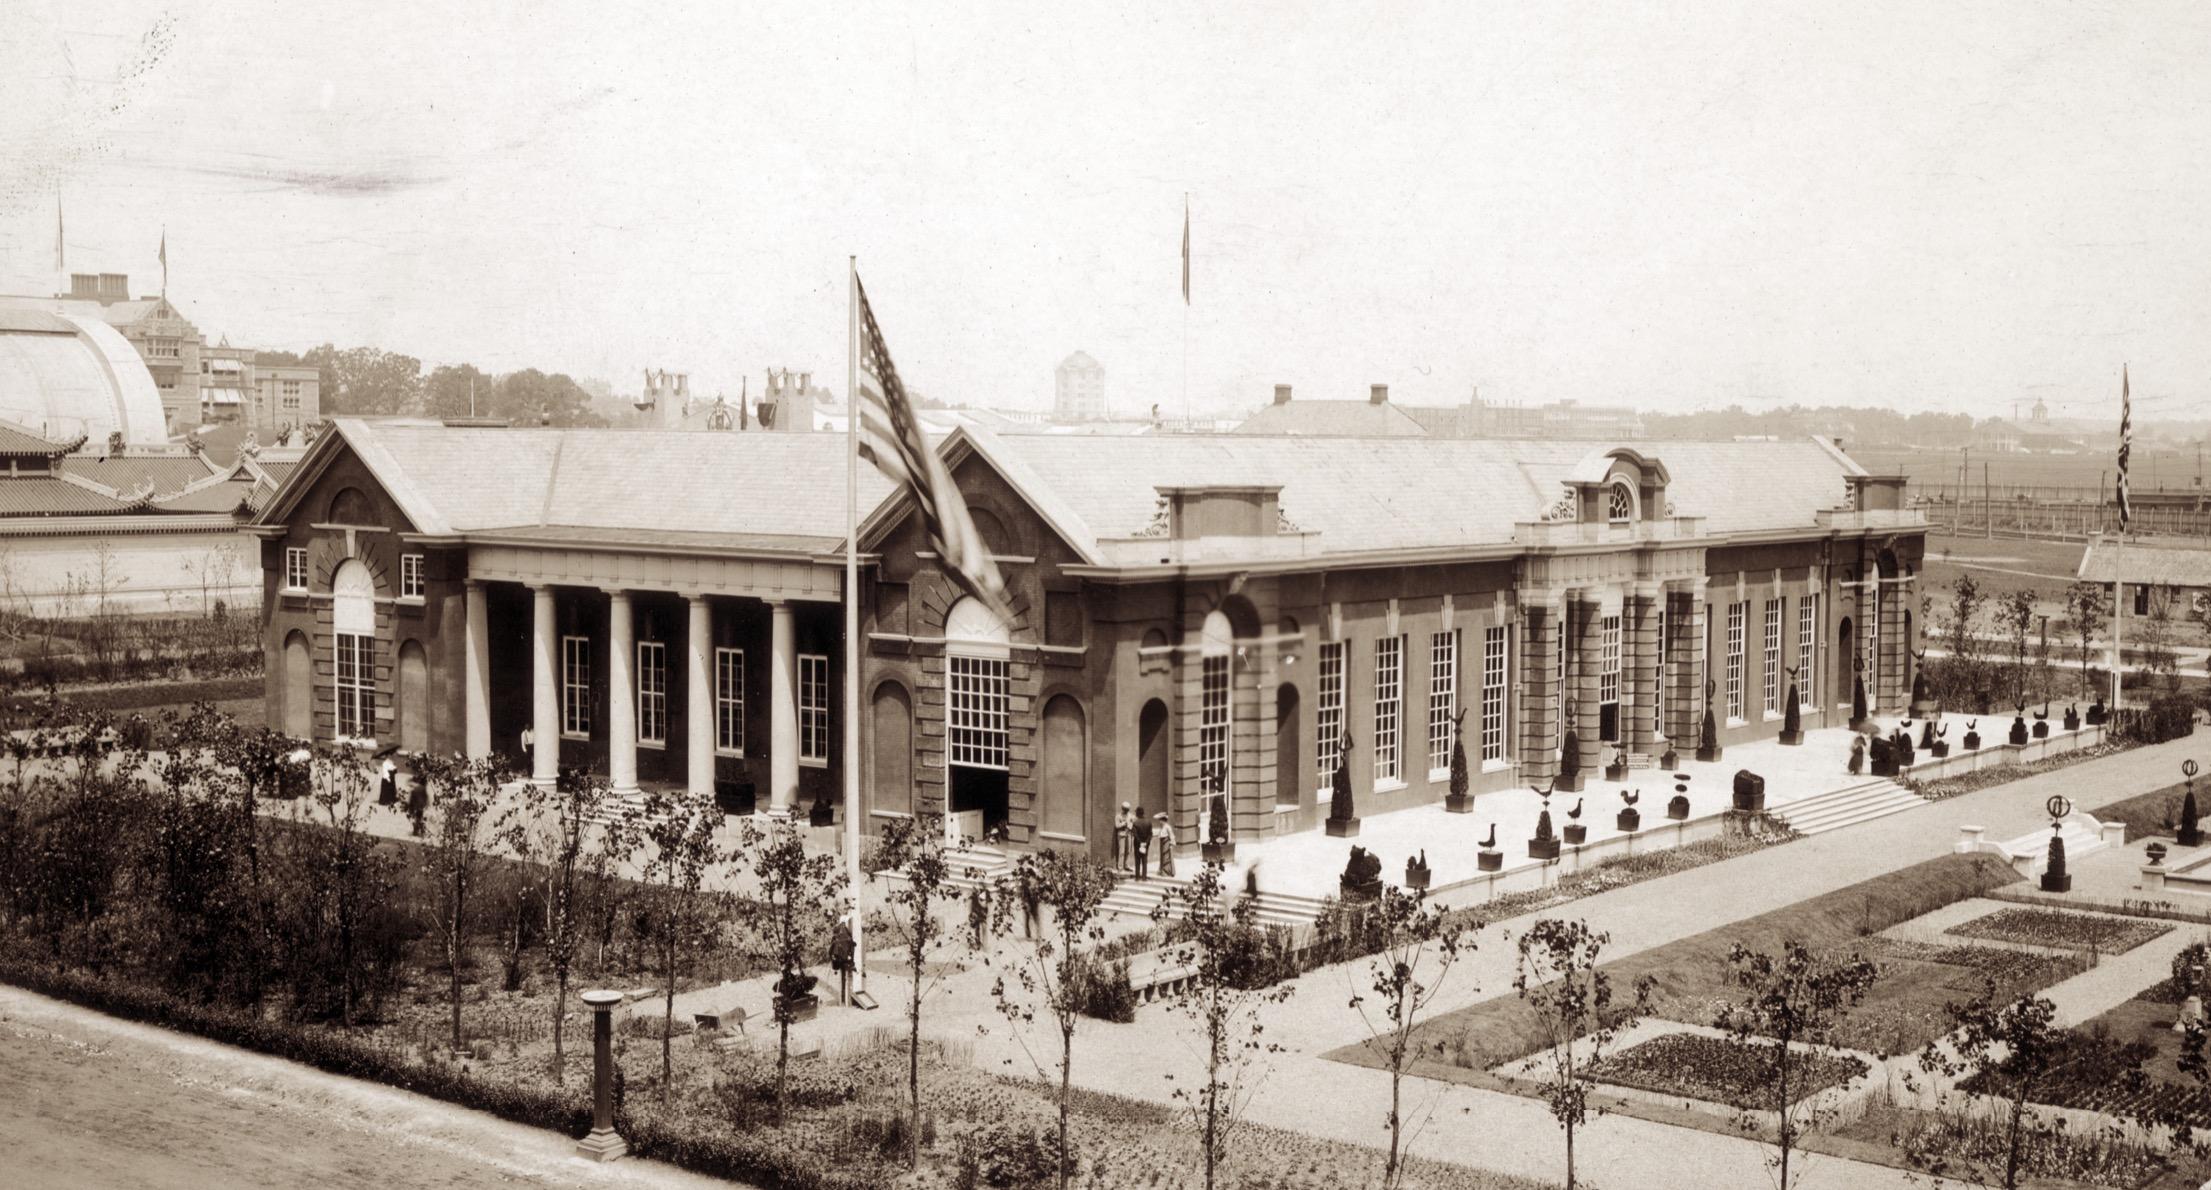 St. Louis 1904 Worlds's Fair, The British Pavilion, Orangery.